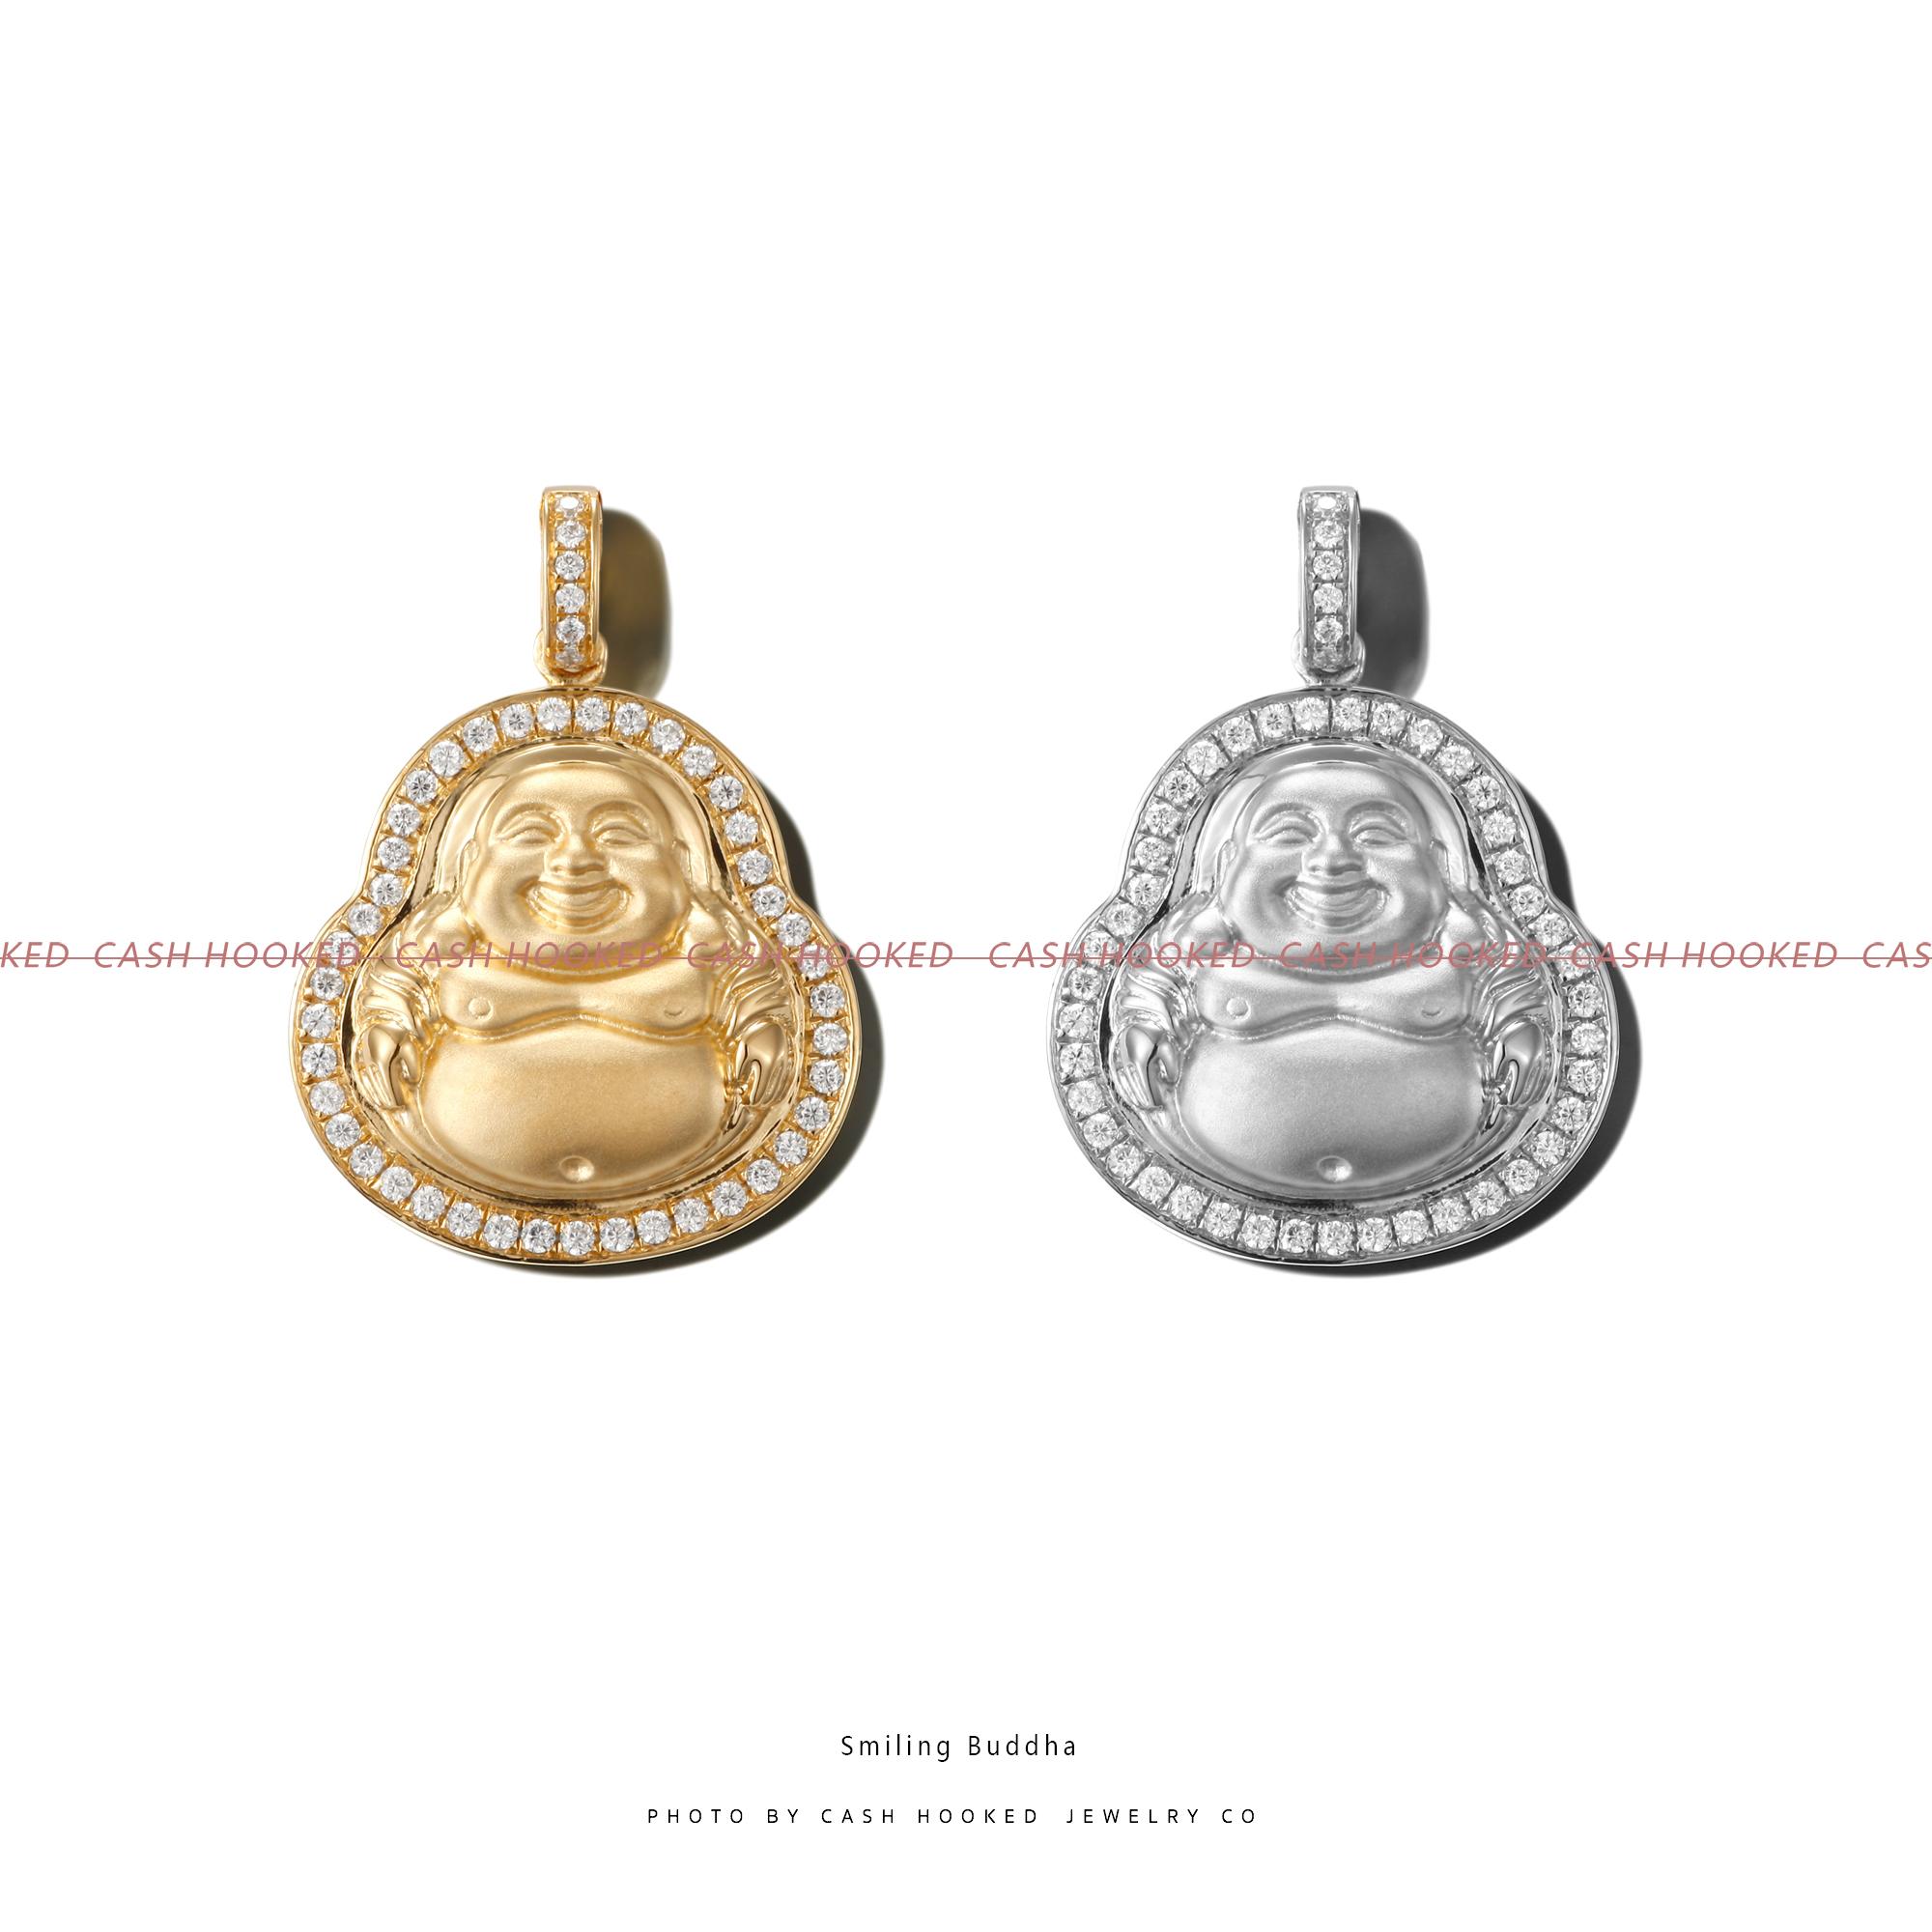 Cash Hooked s925银镀金 Smiling Buddha/大笑脸弥勒佛 嘻哈项链